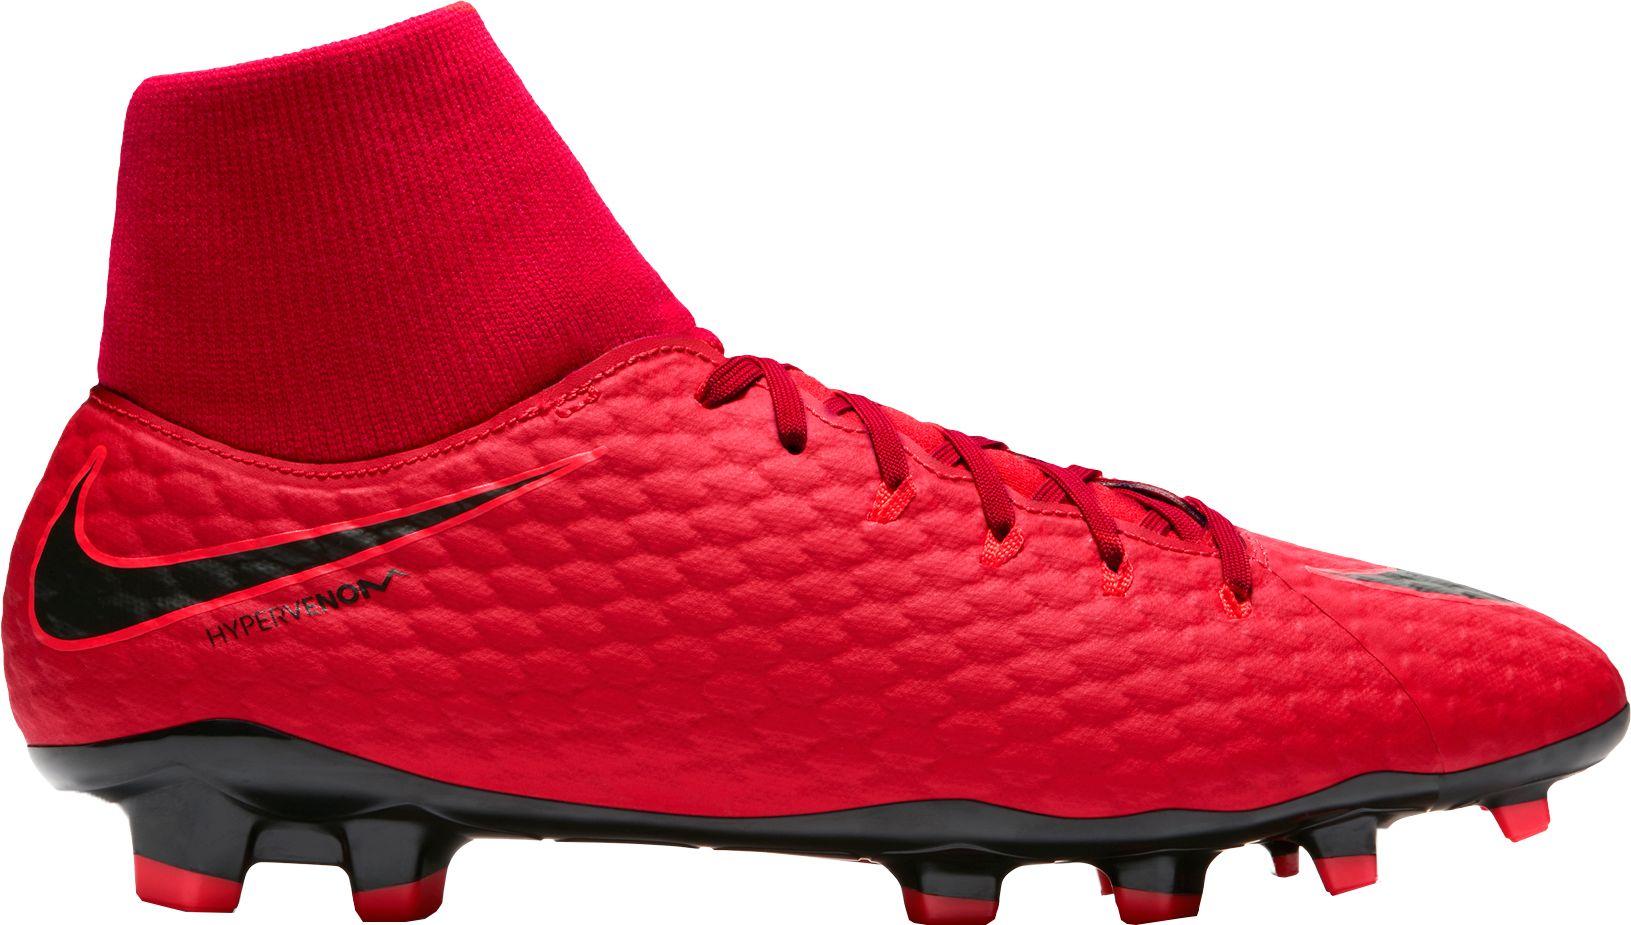 Product Image � Nike Men\u0027s Hypervenom Phelon III Dynamic Fit FG Soccer  Cleats. Red/Black